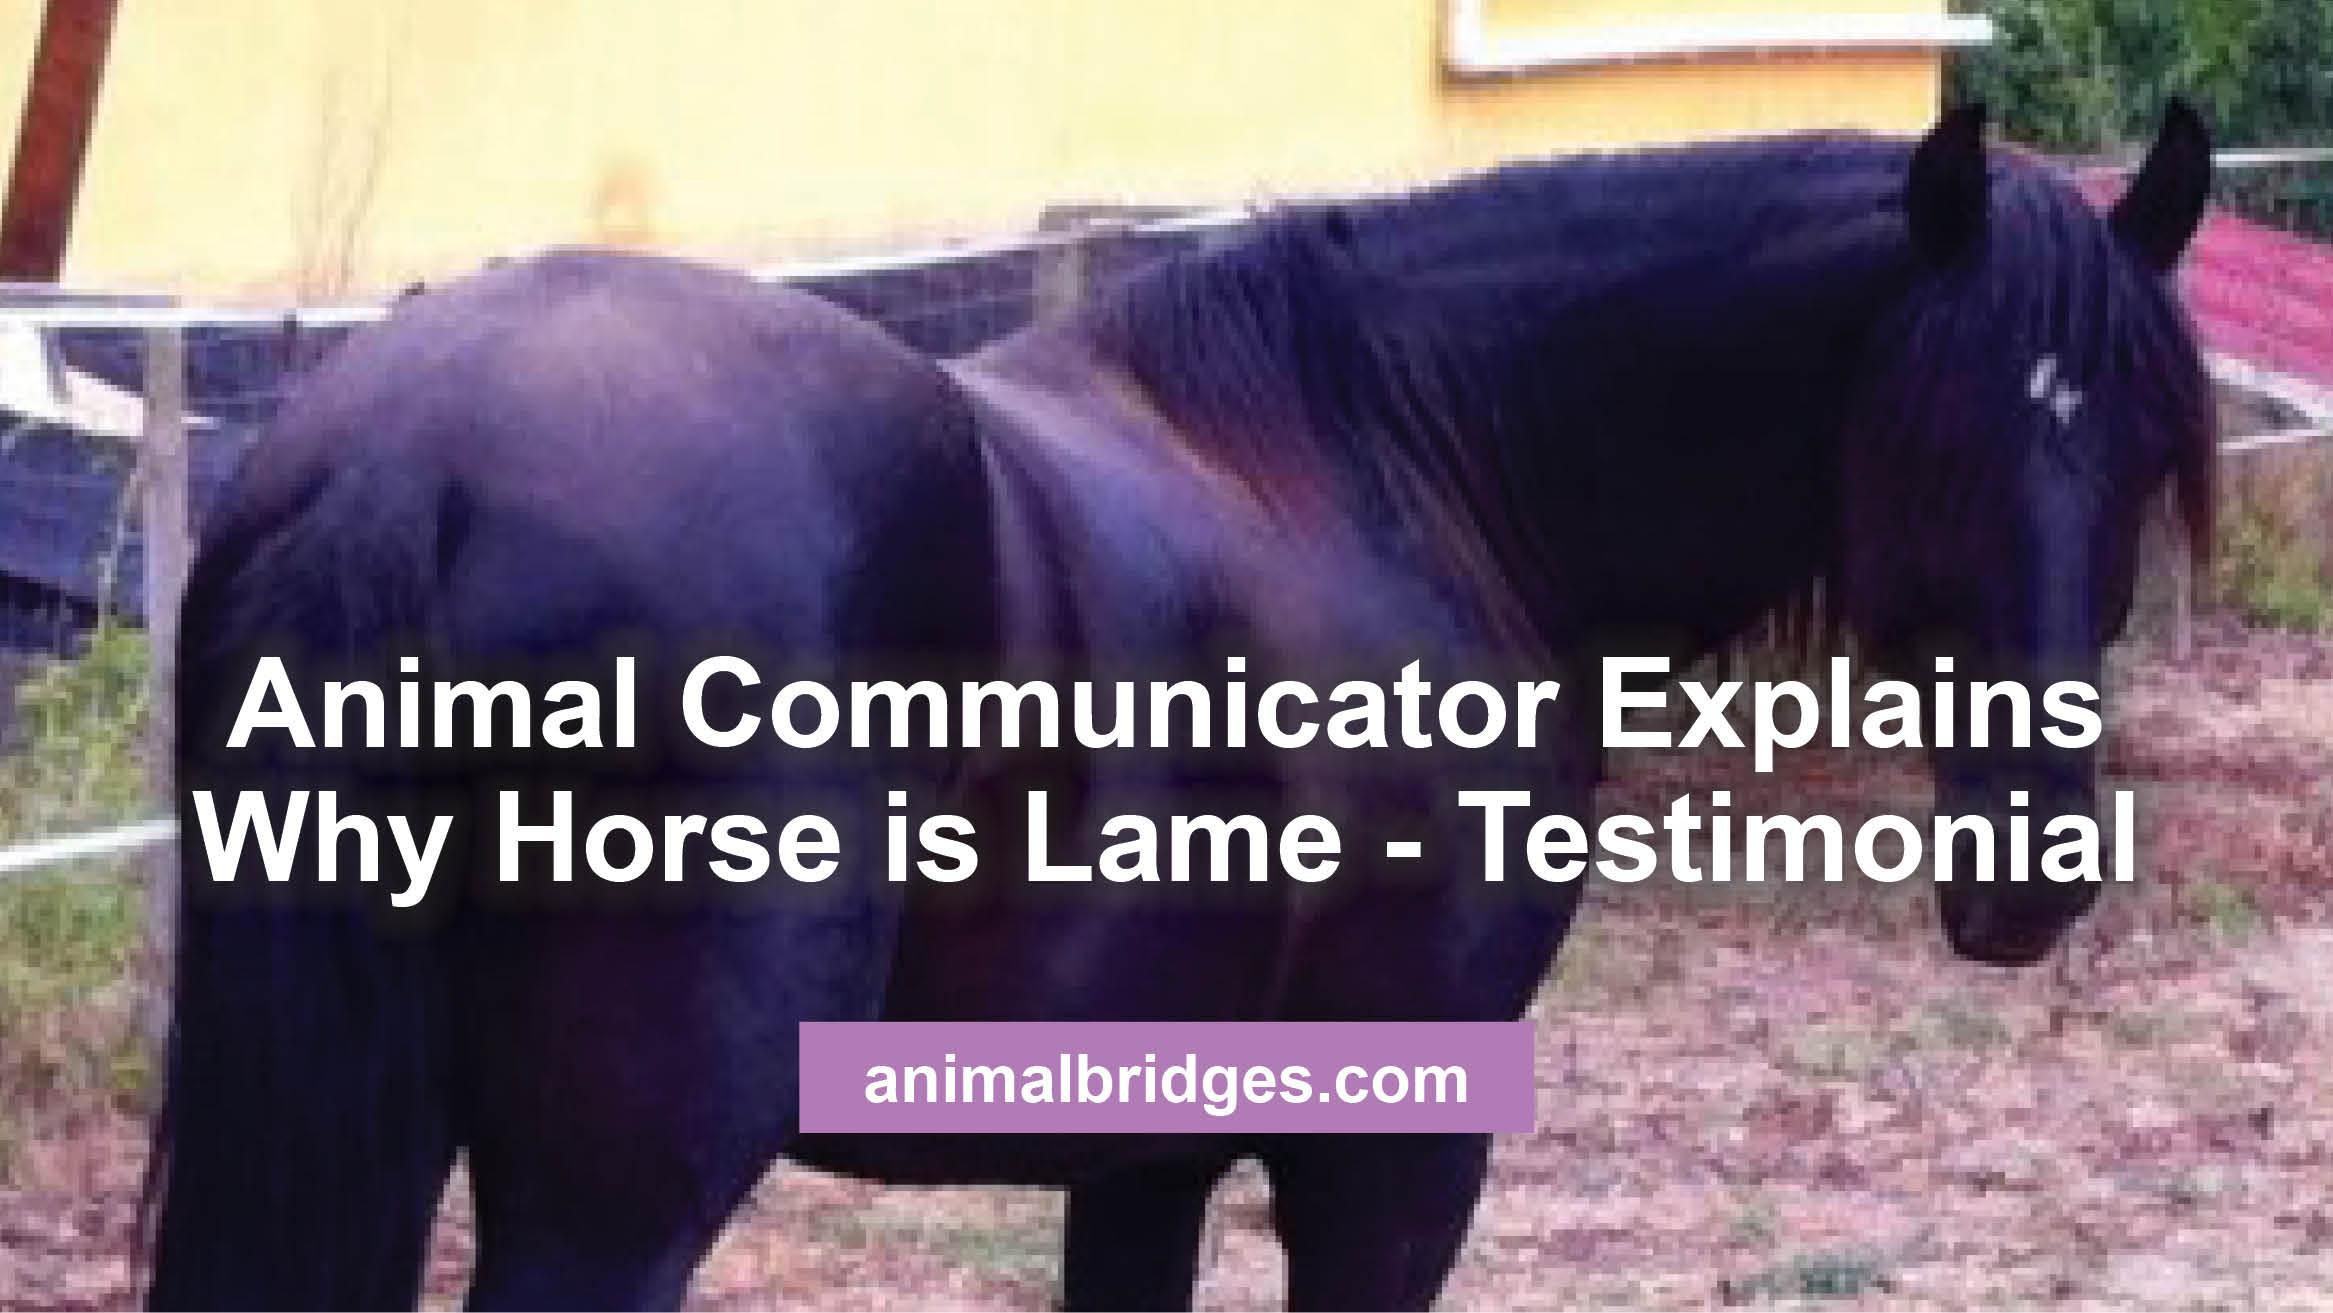 lame-horse